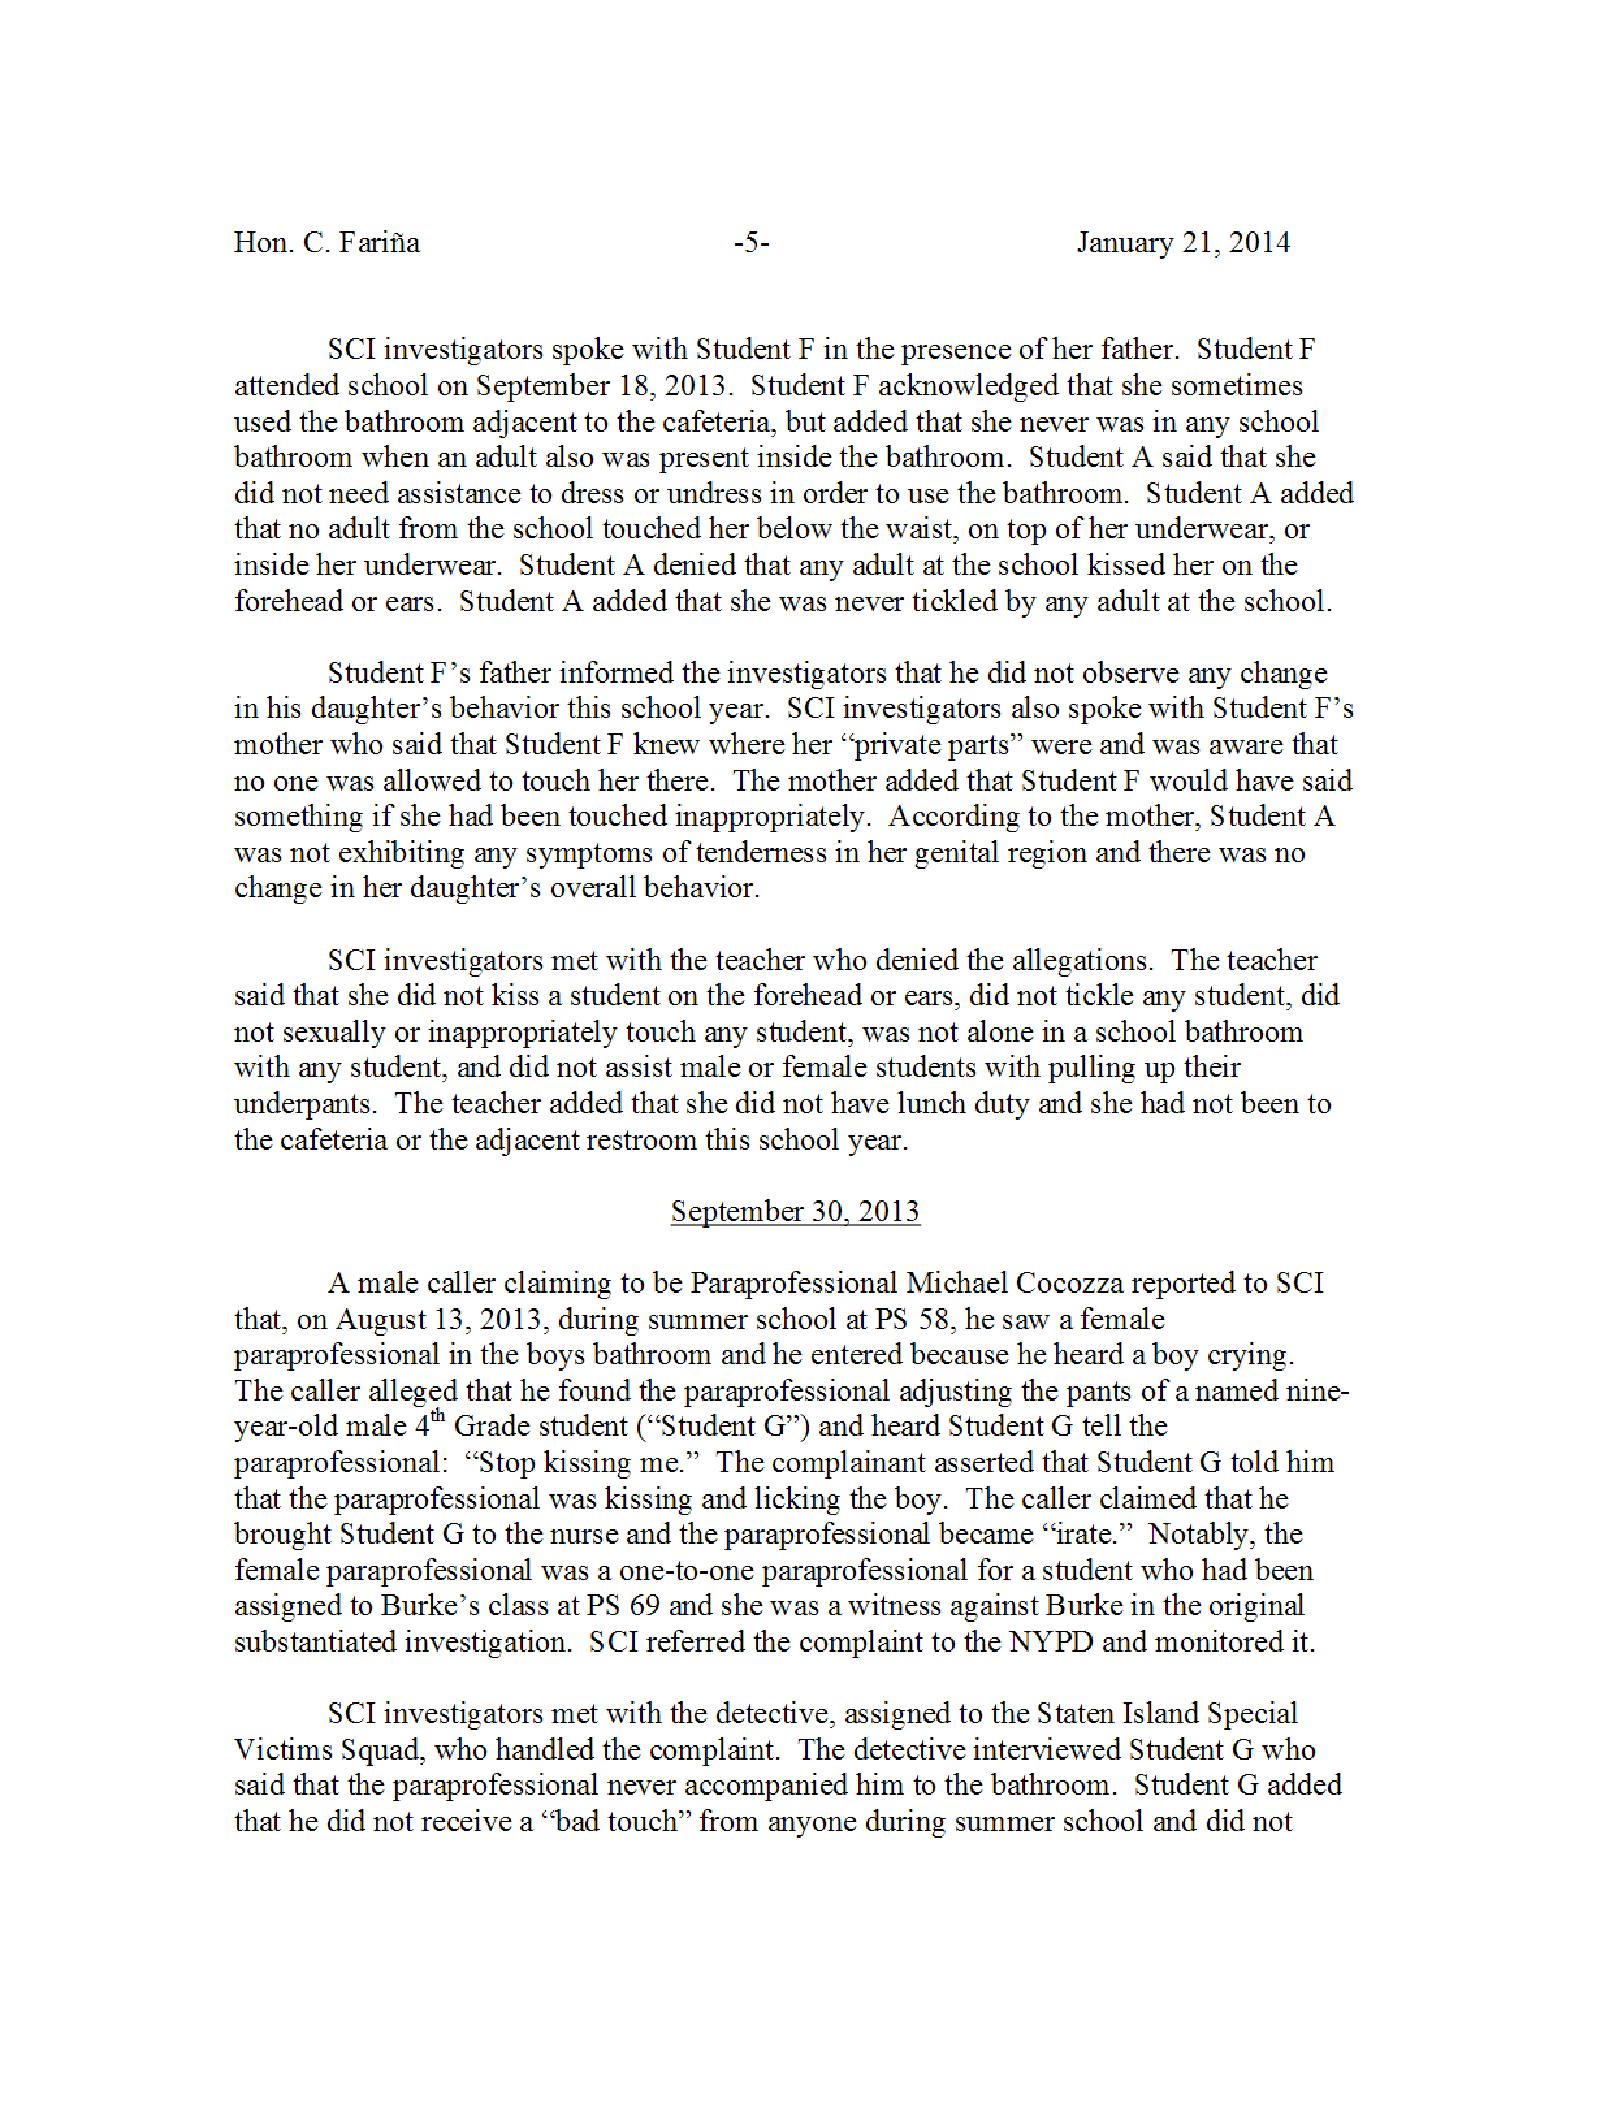 Copy of 1-22-2014 9-25-02 AM05.png